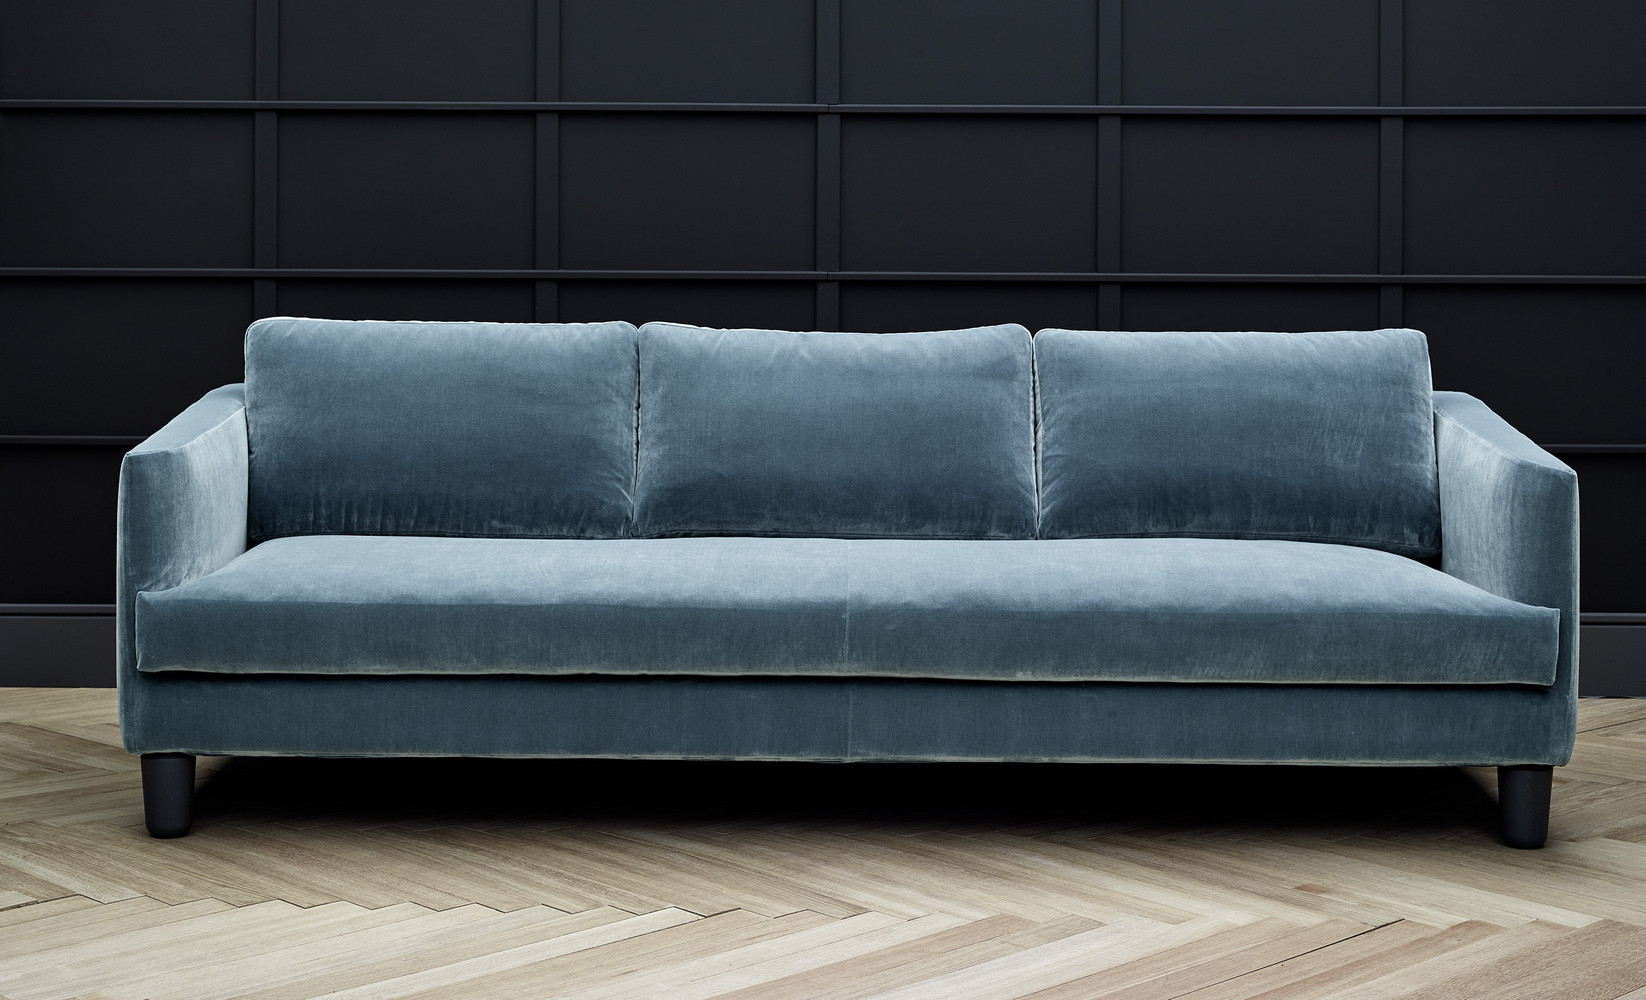 Sof y sill n joquer mod venice muebles pulido - Outlet muebles hogar y decoracion madrid ...